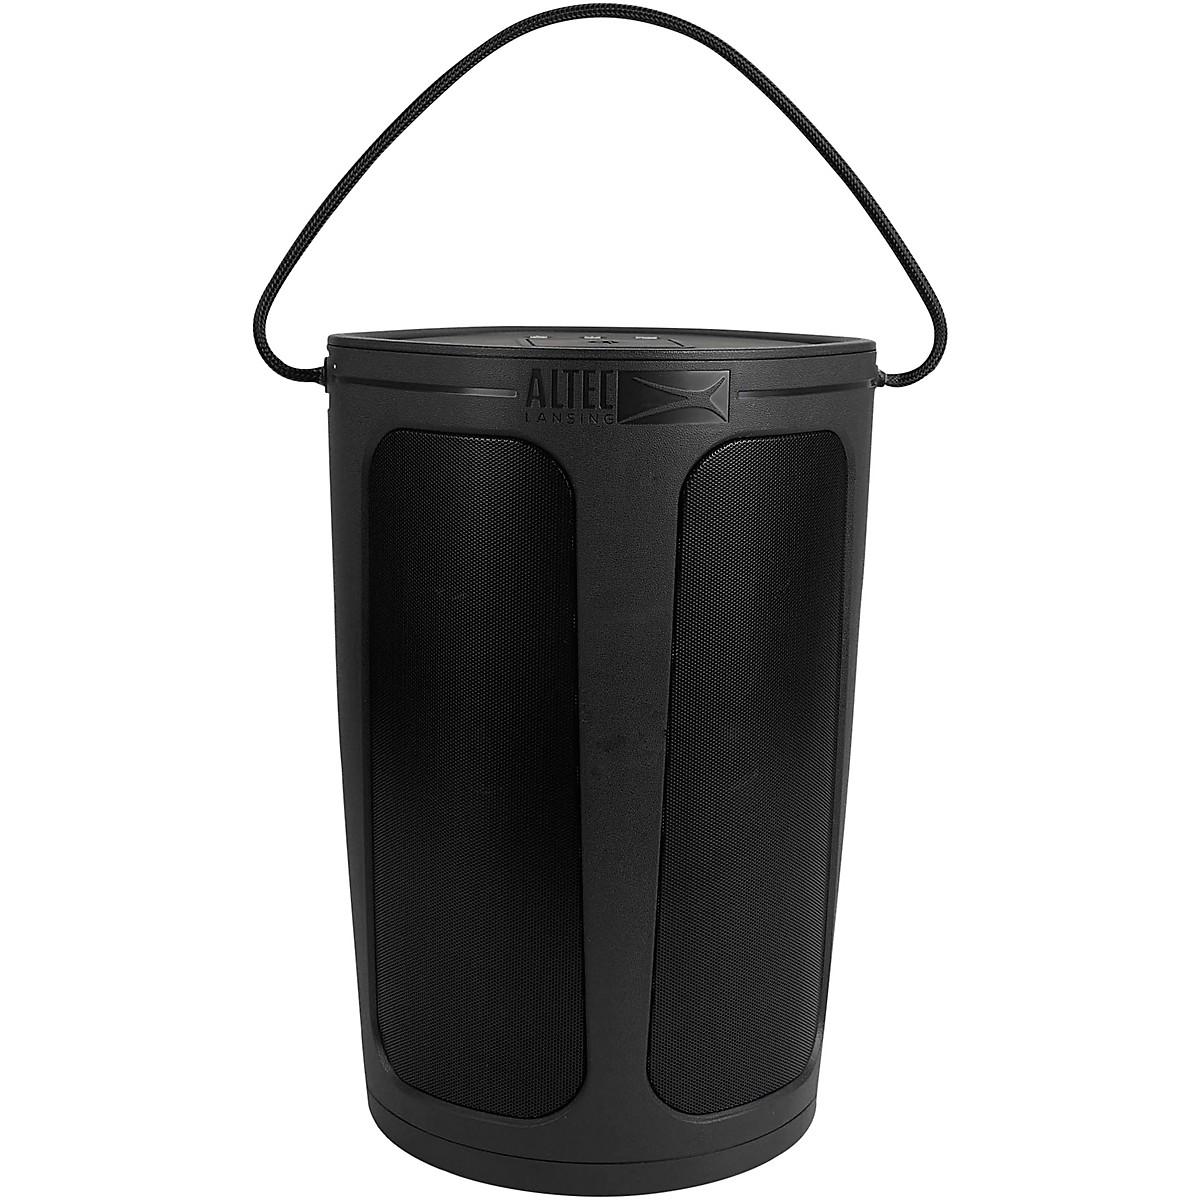 Altec Lansing Sound Bucket XL Rugged Portable Bluetooth Spaker